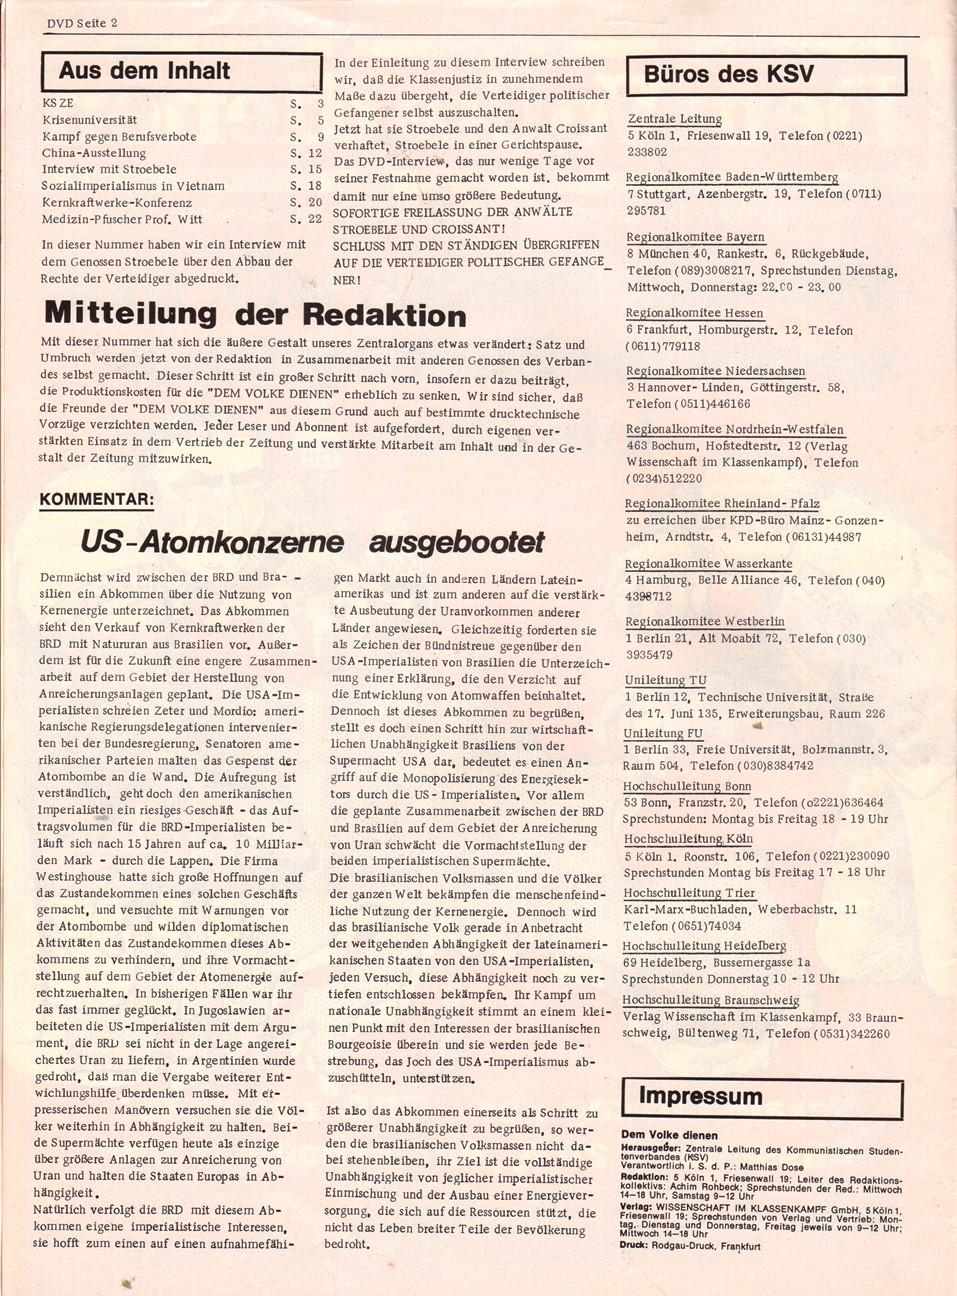 Koeln_KSV_DVD_19750625_02